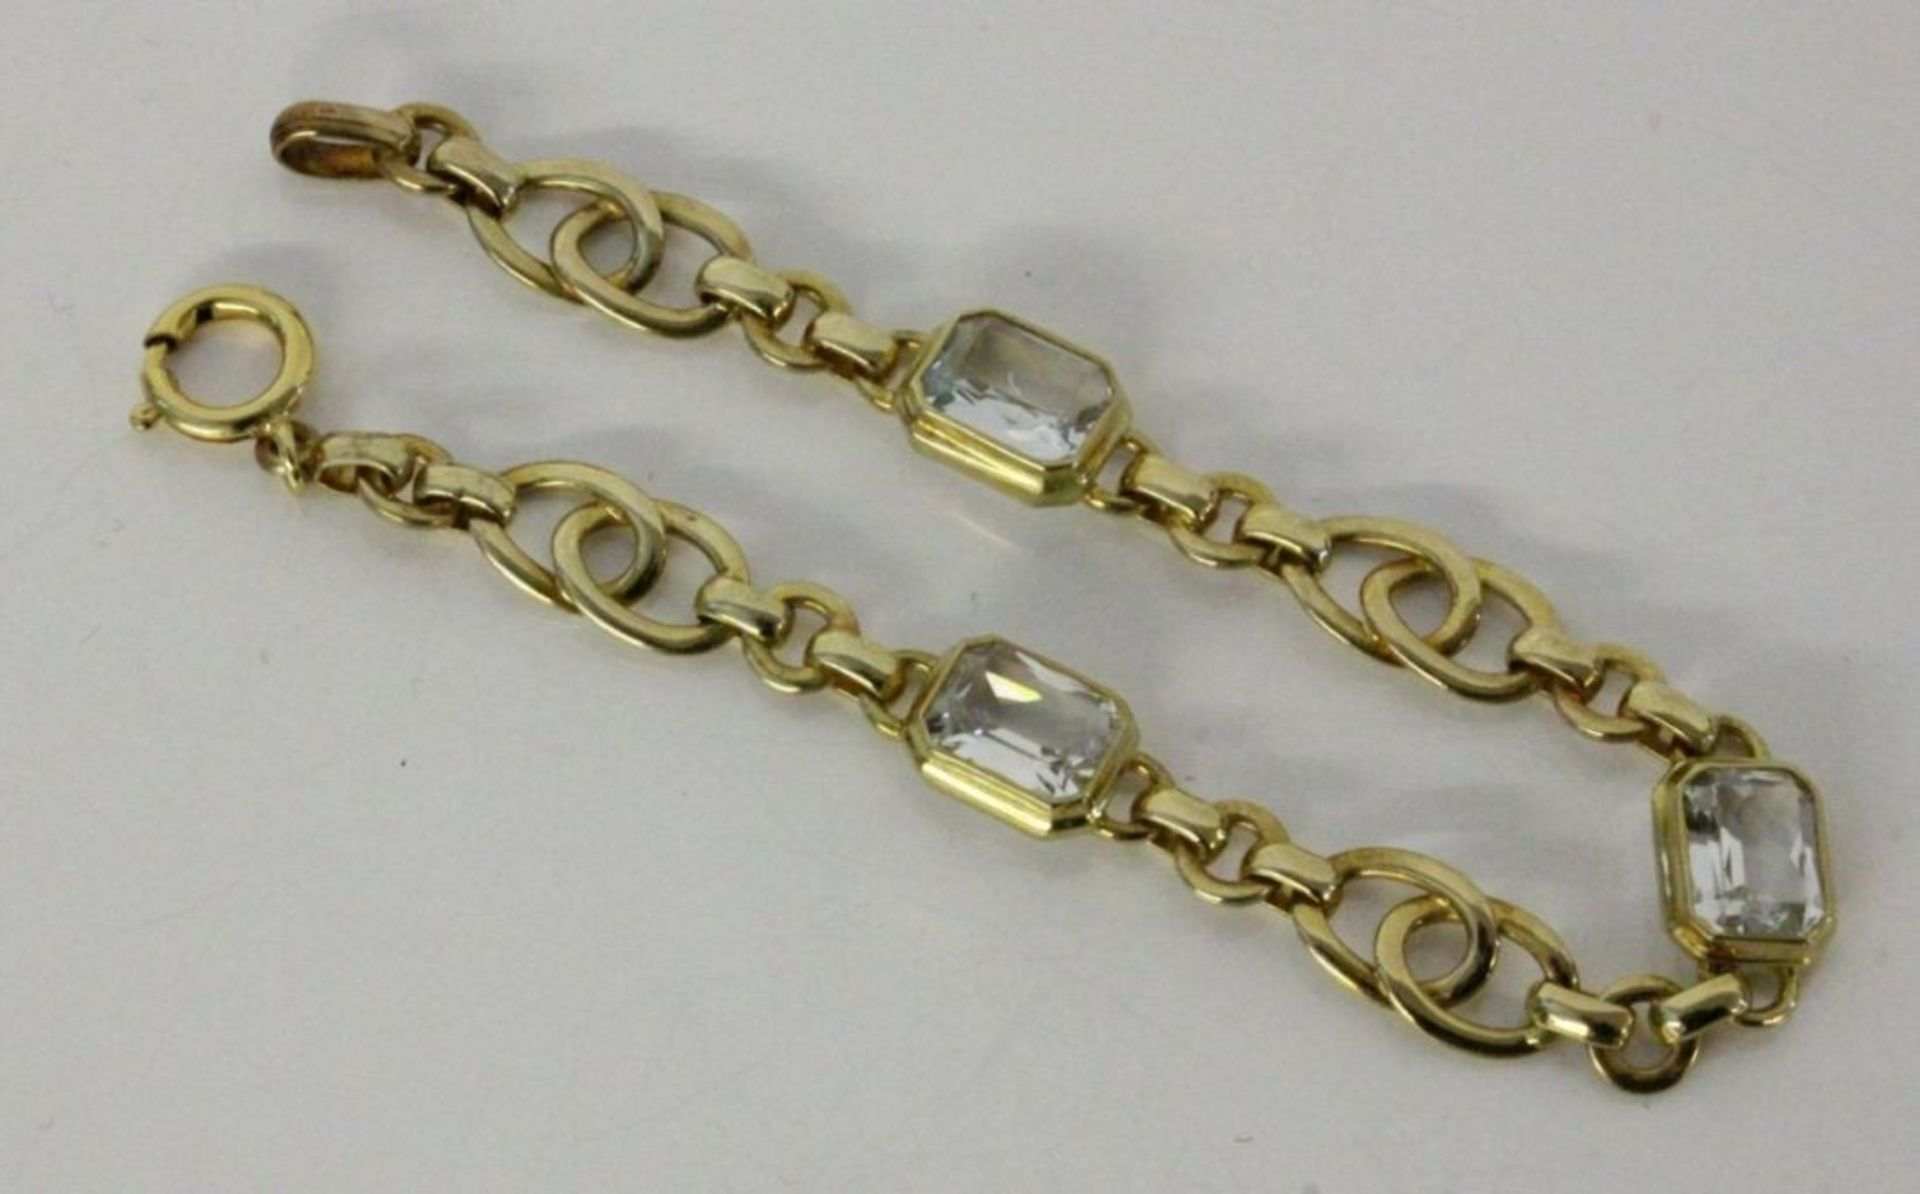 ARMBANDSilber vergoldet mit Aquamarinen. L.18cmA BRACELET Silver, gold-plated with aquamarines. 18